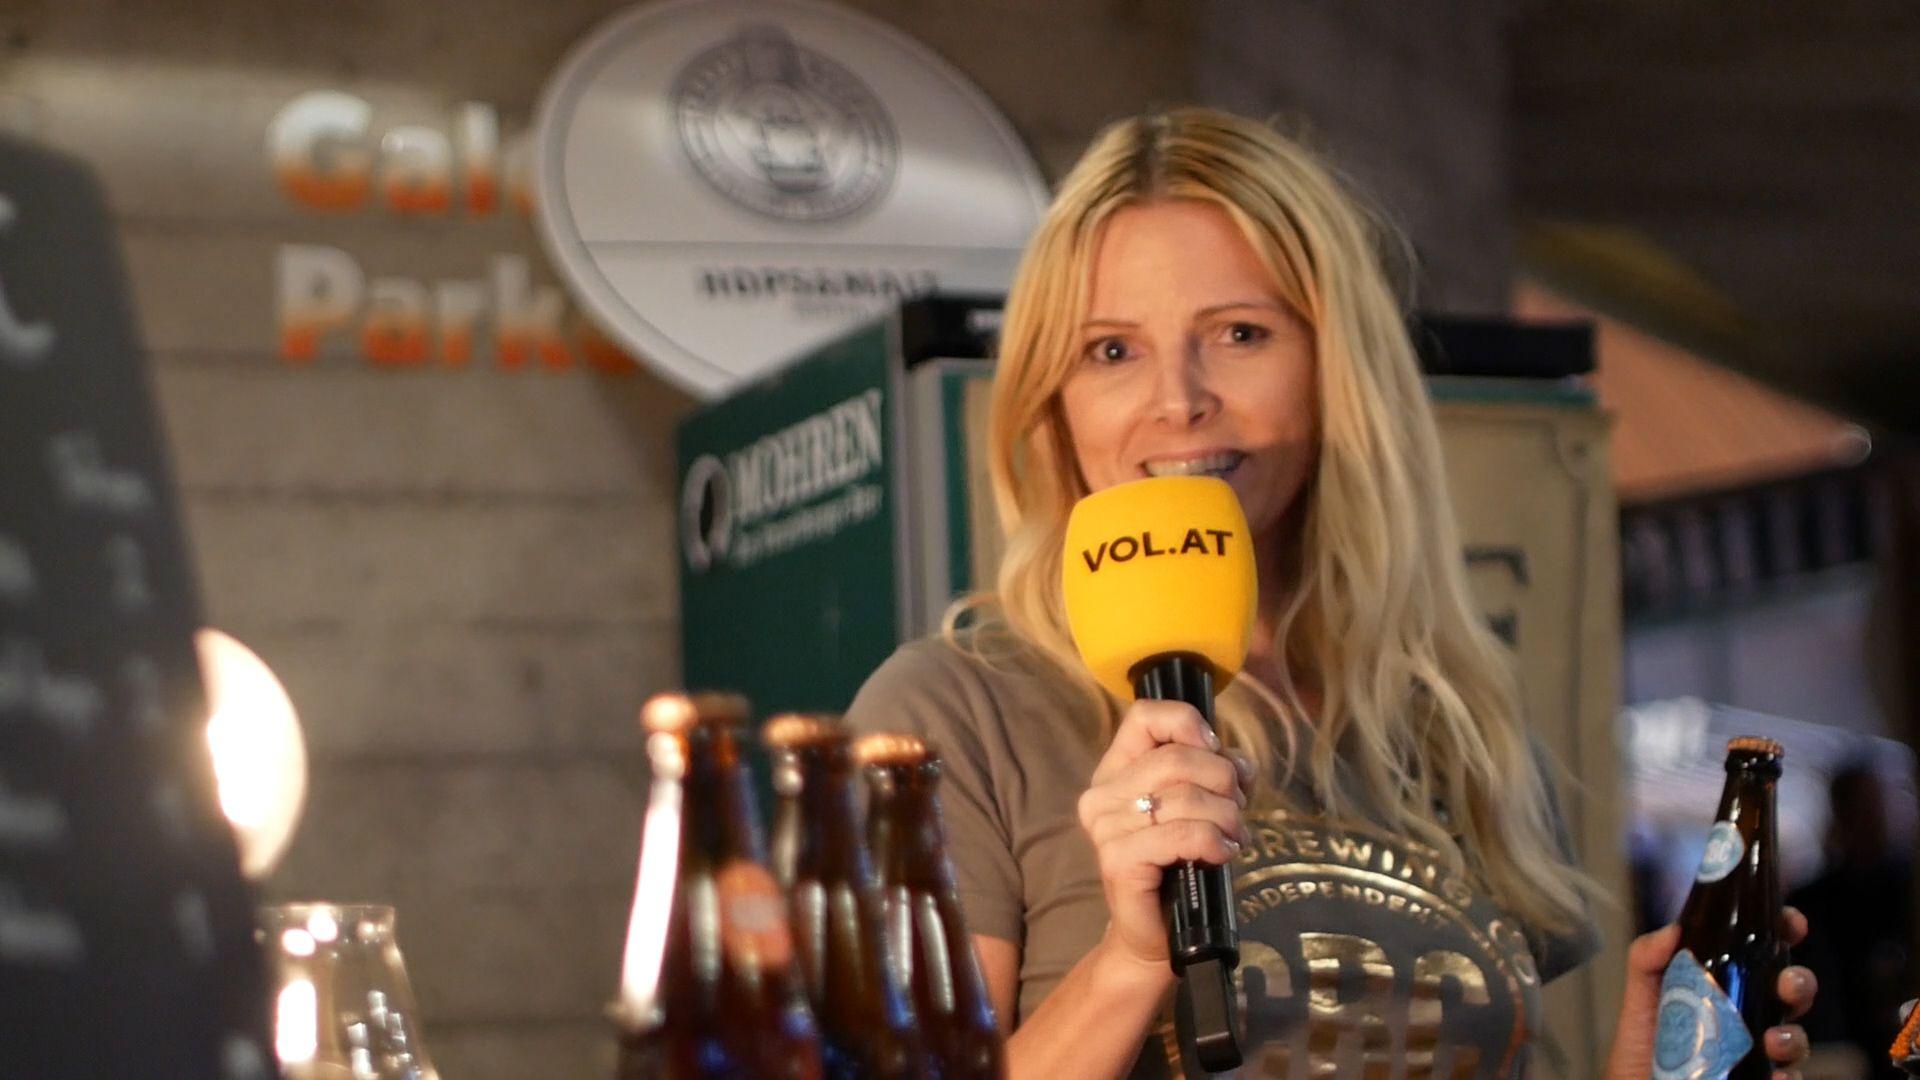 Reise um den Globus beim Craft Beer Festival in Dornbirn